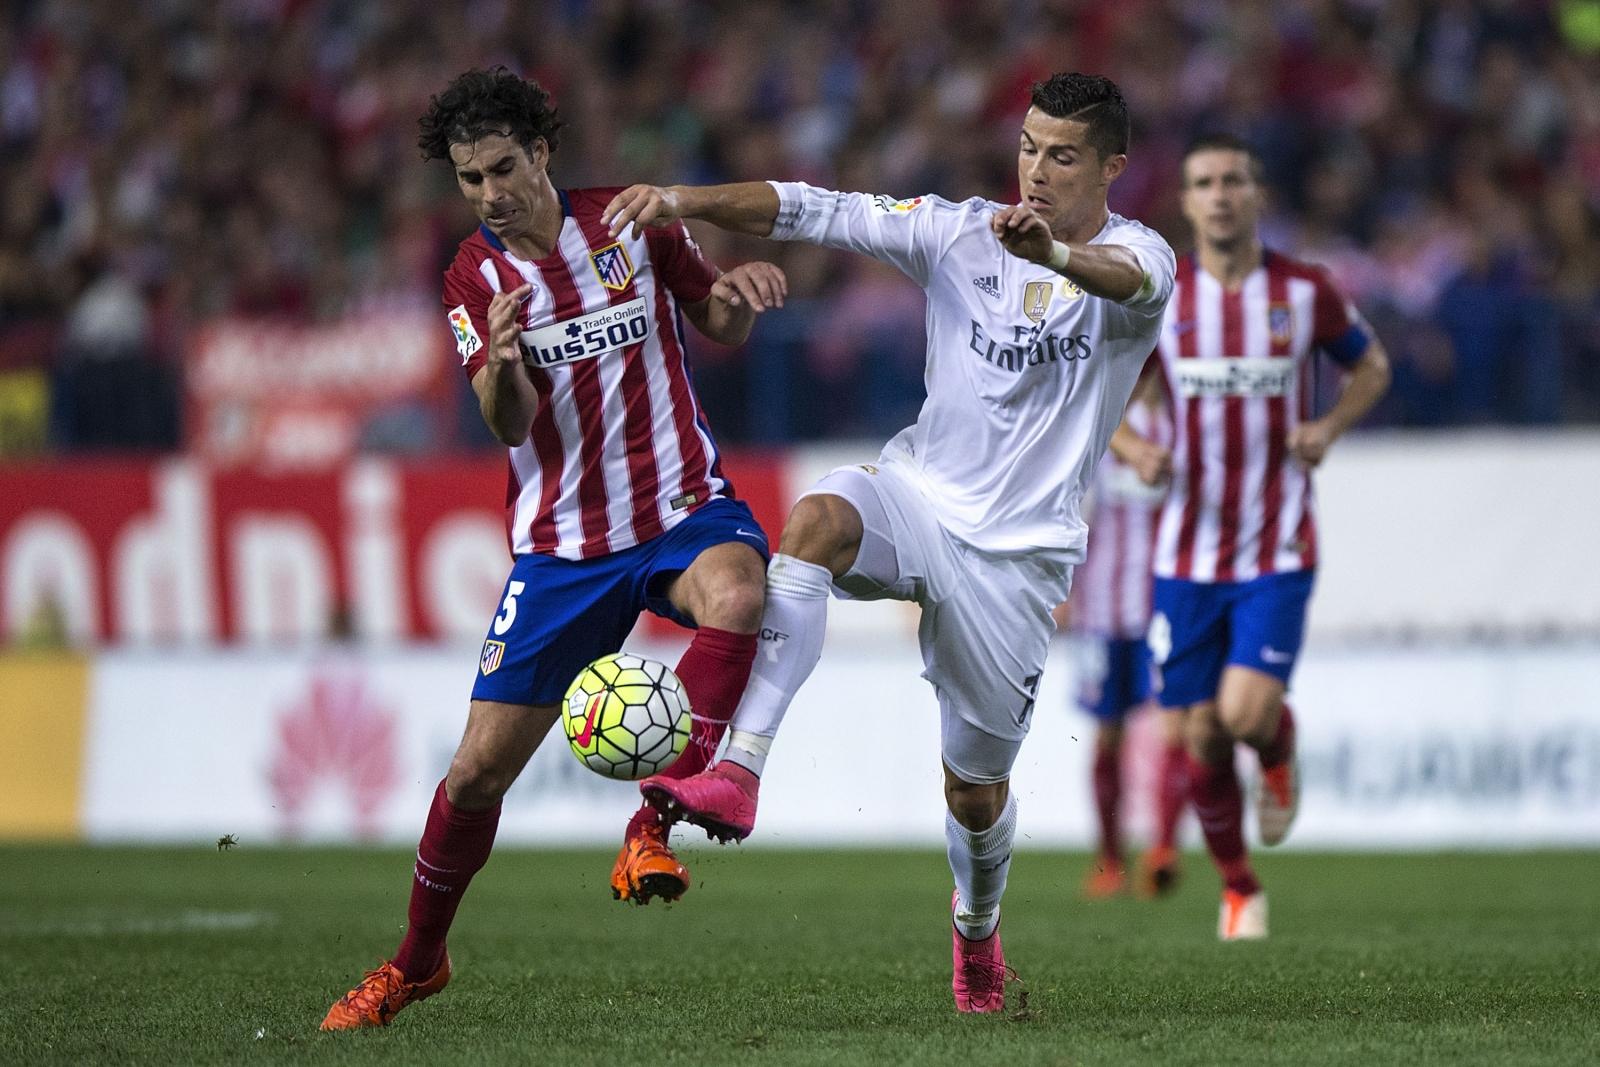 Tiago and Cristiano Ronaldo